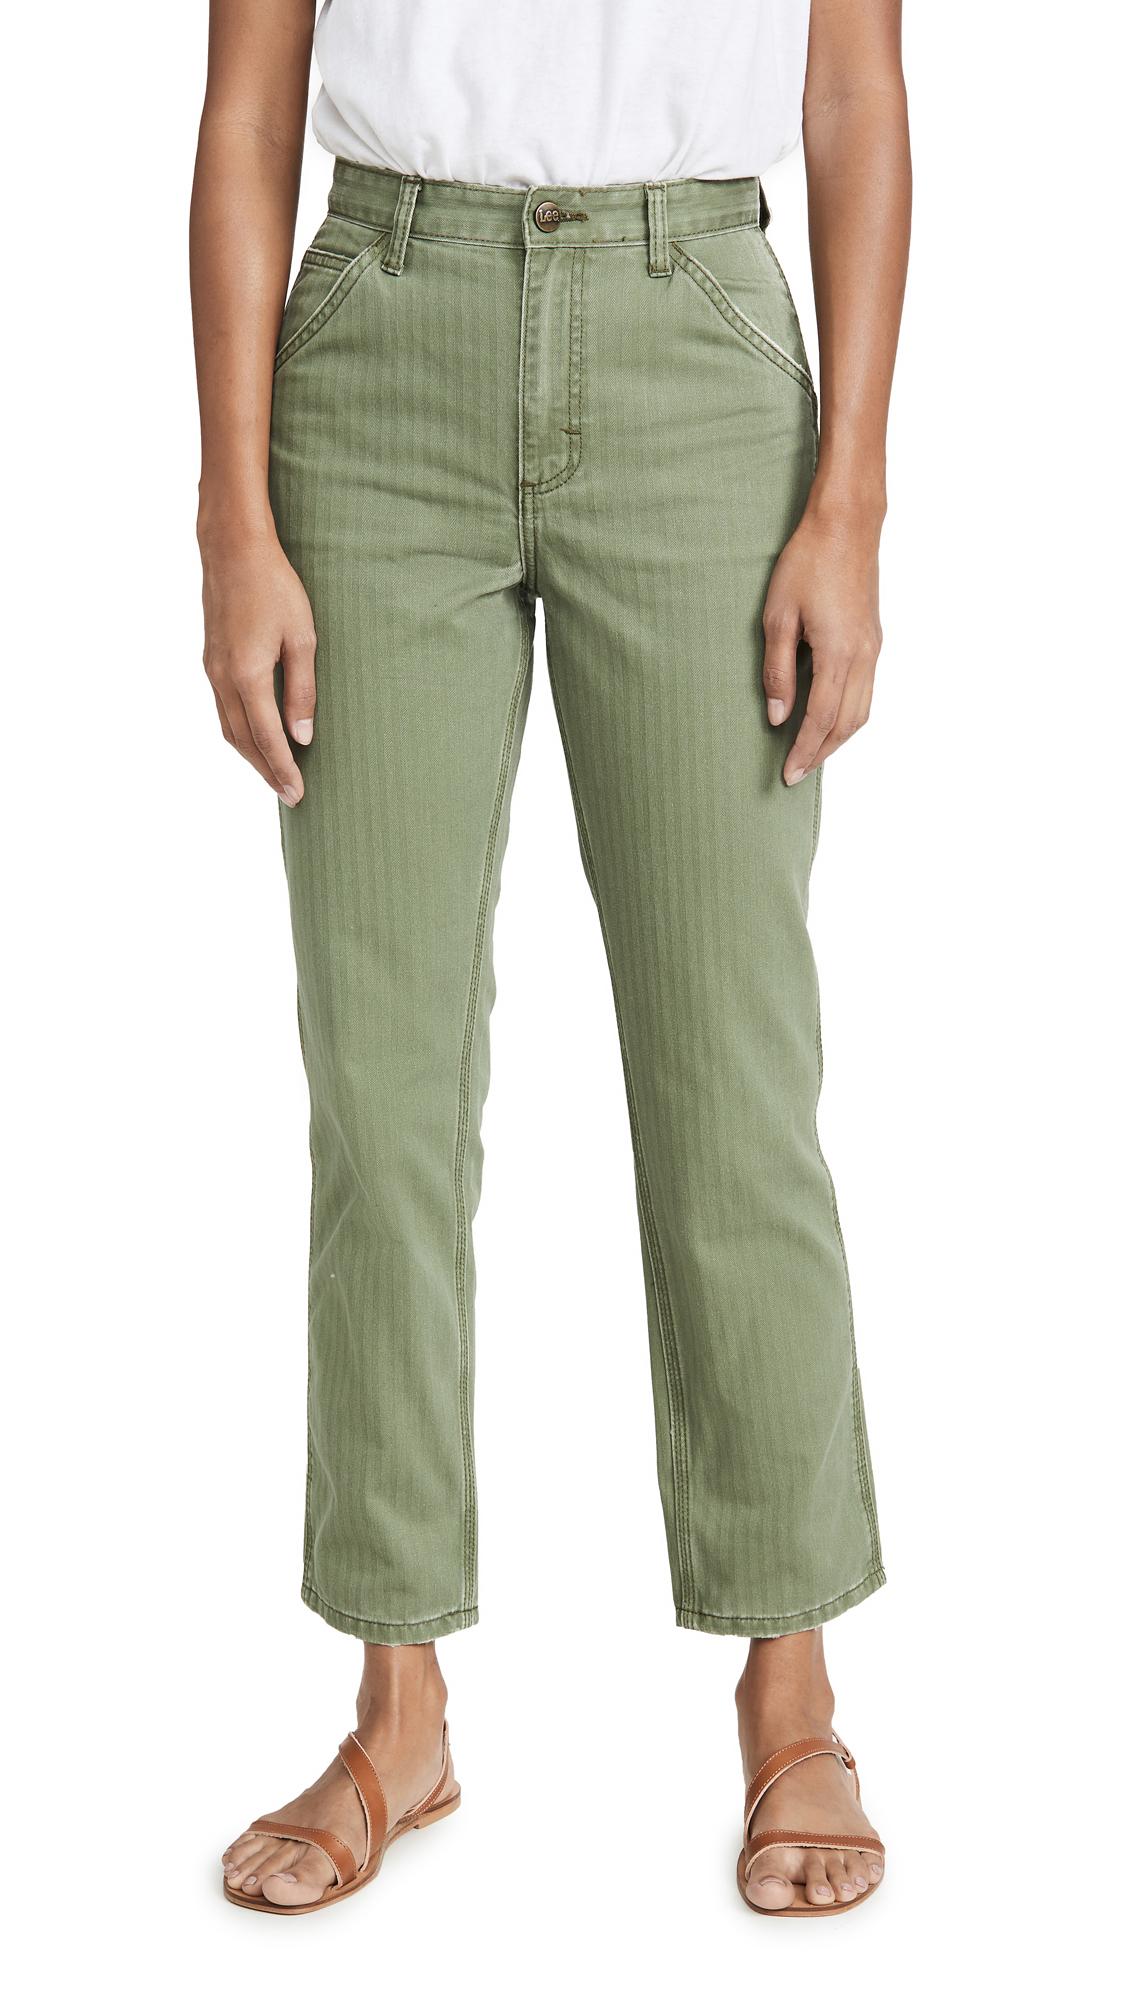 Lee Vintage Modern High Rise Dungaree Ankle Jeans - Vintage Olive Herringbone